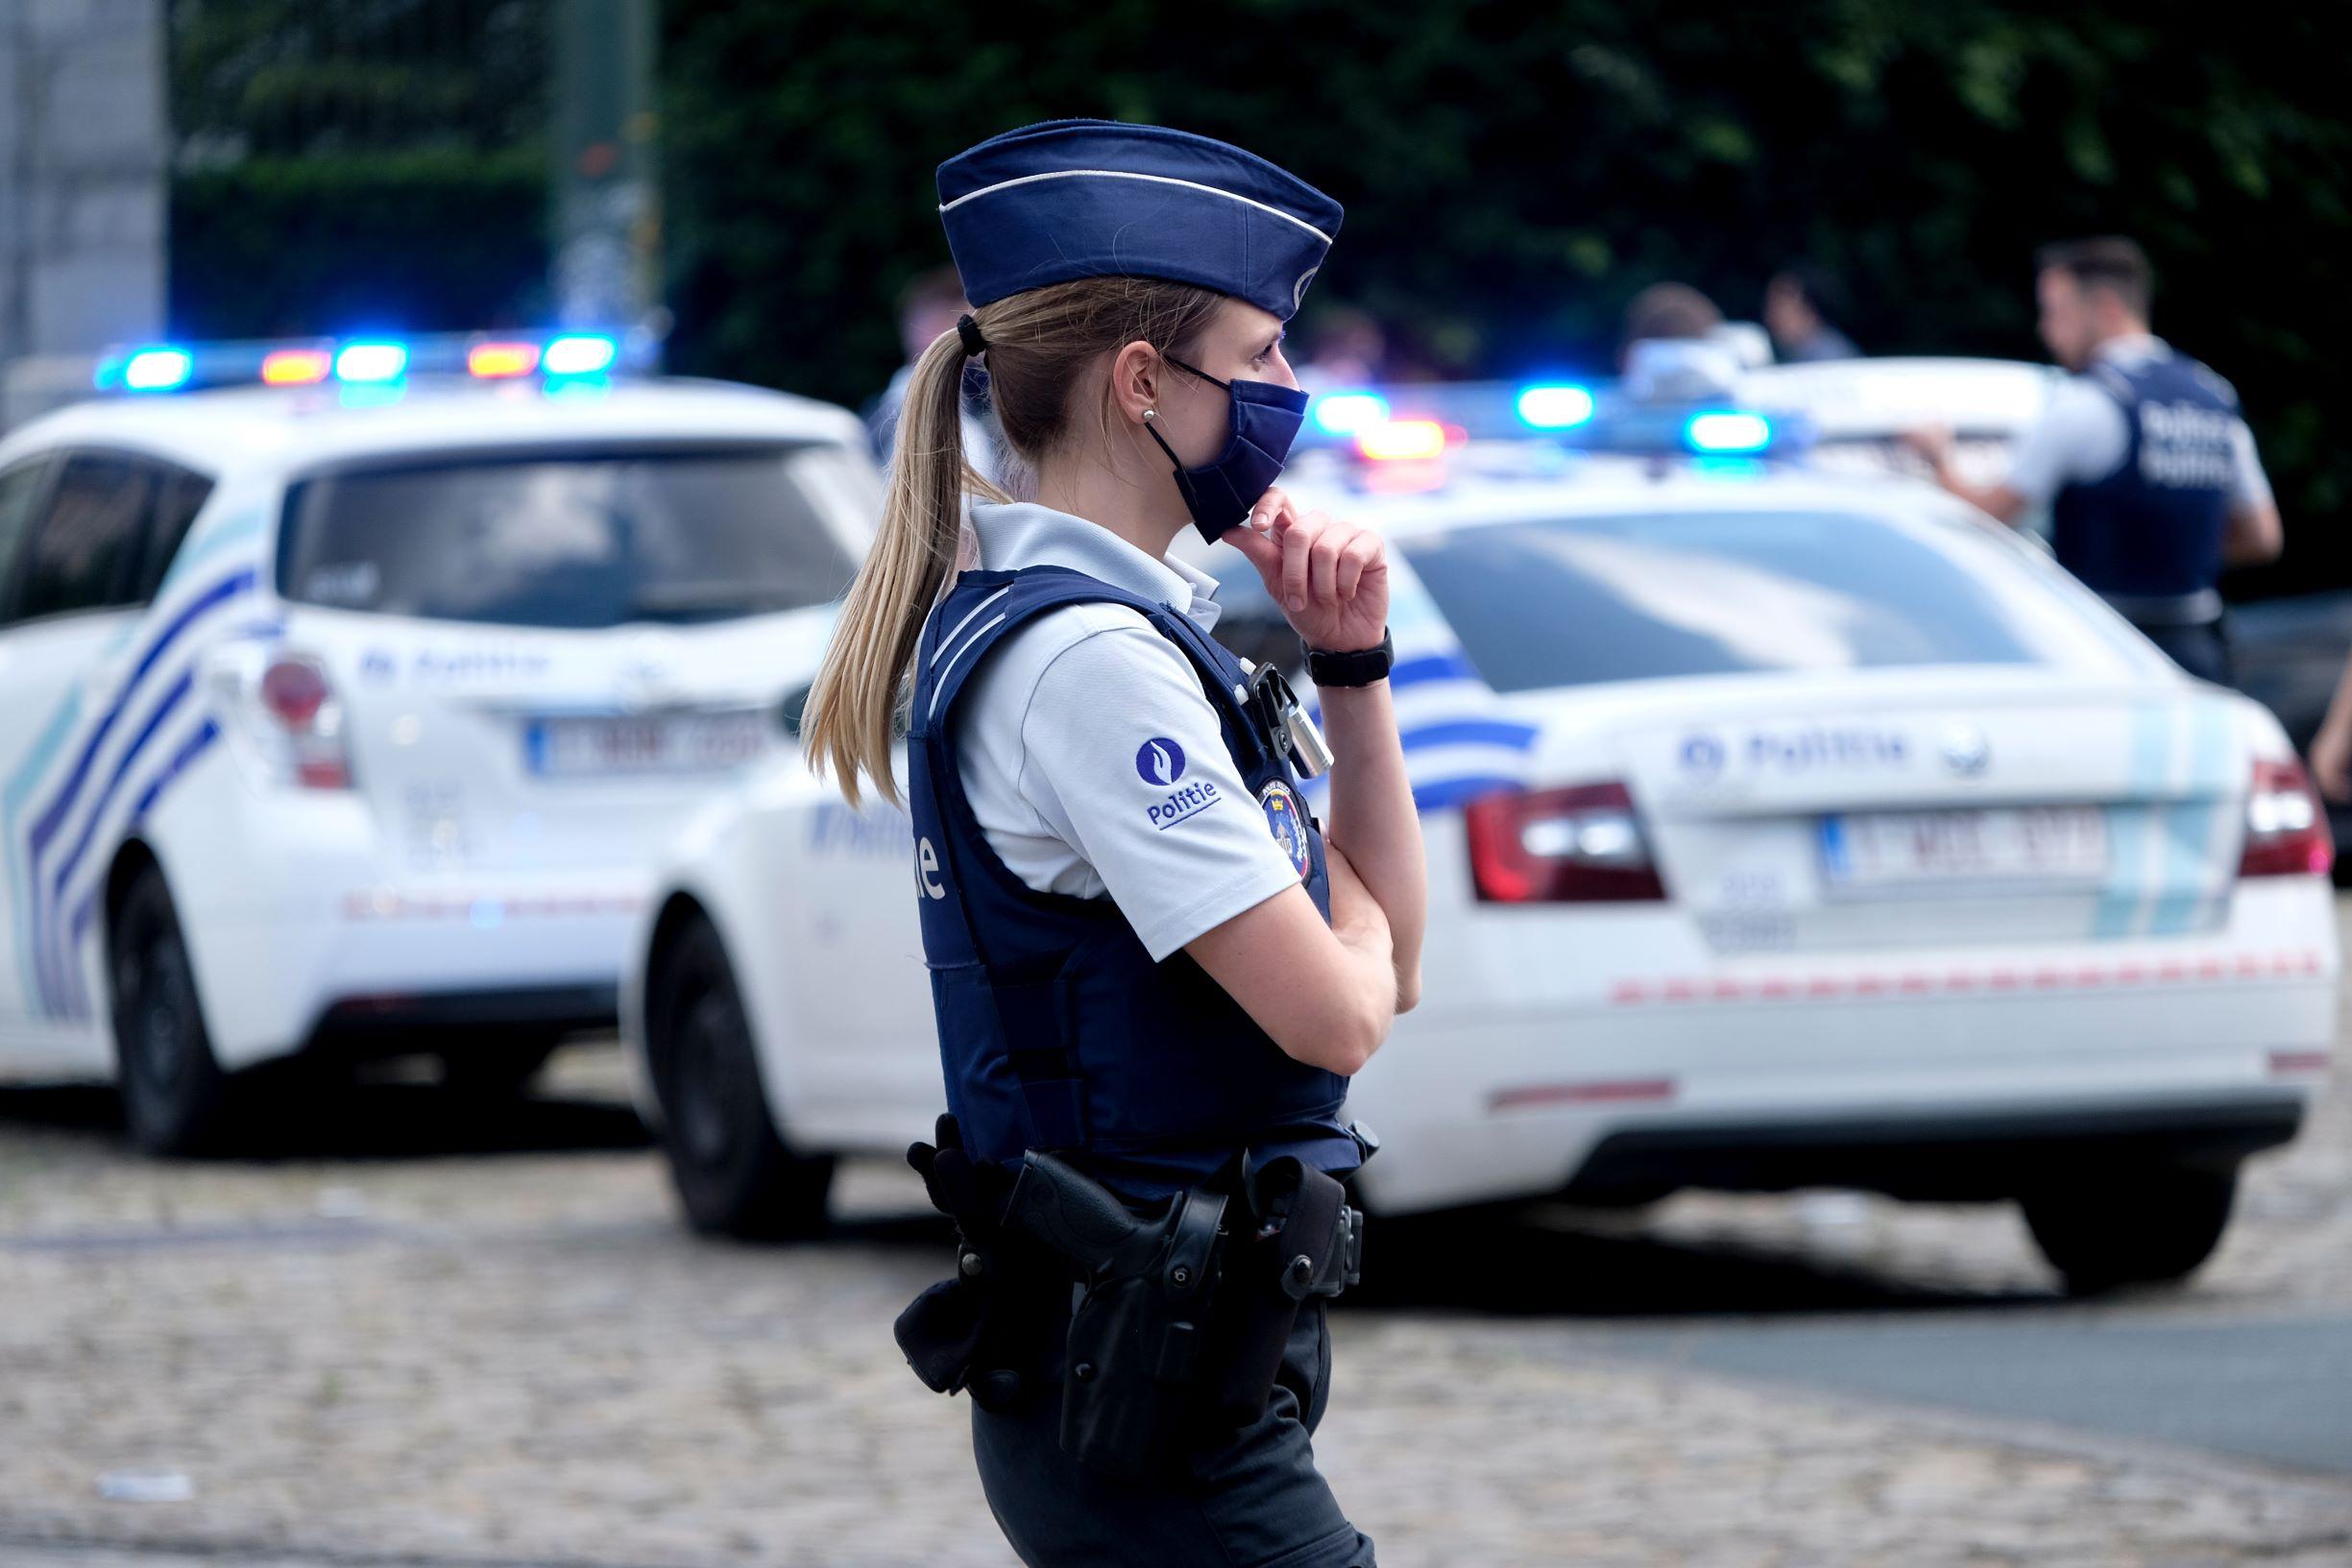 Newsletter 2020-111 : Le filmage des fonctionnaires de police